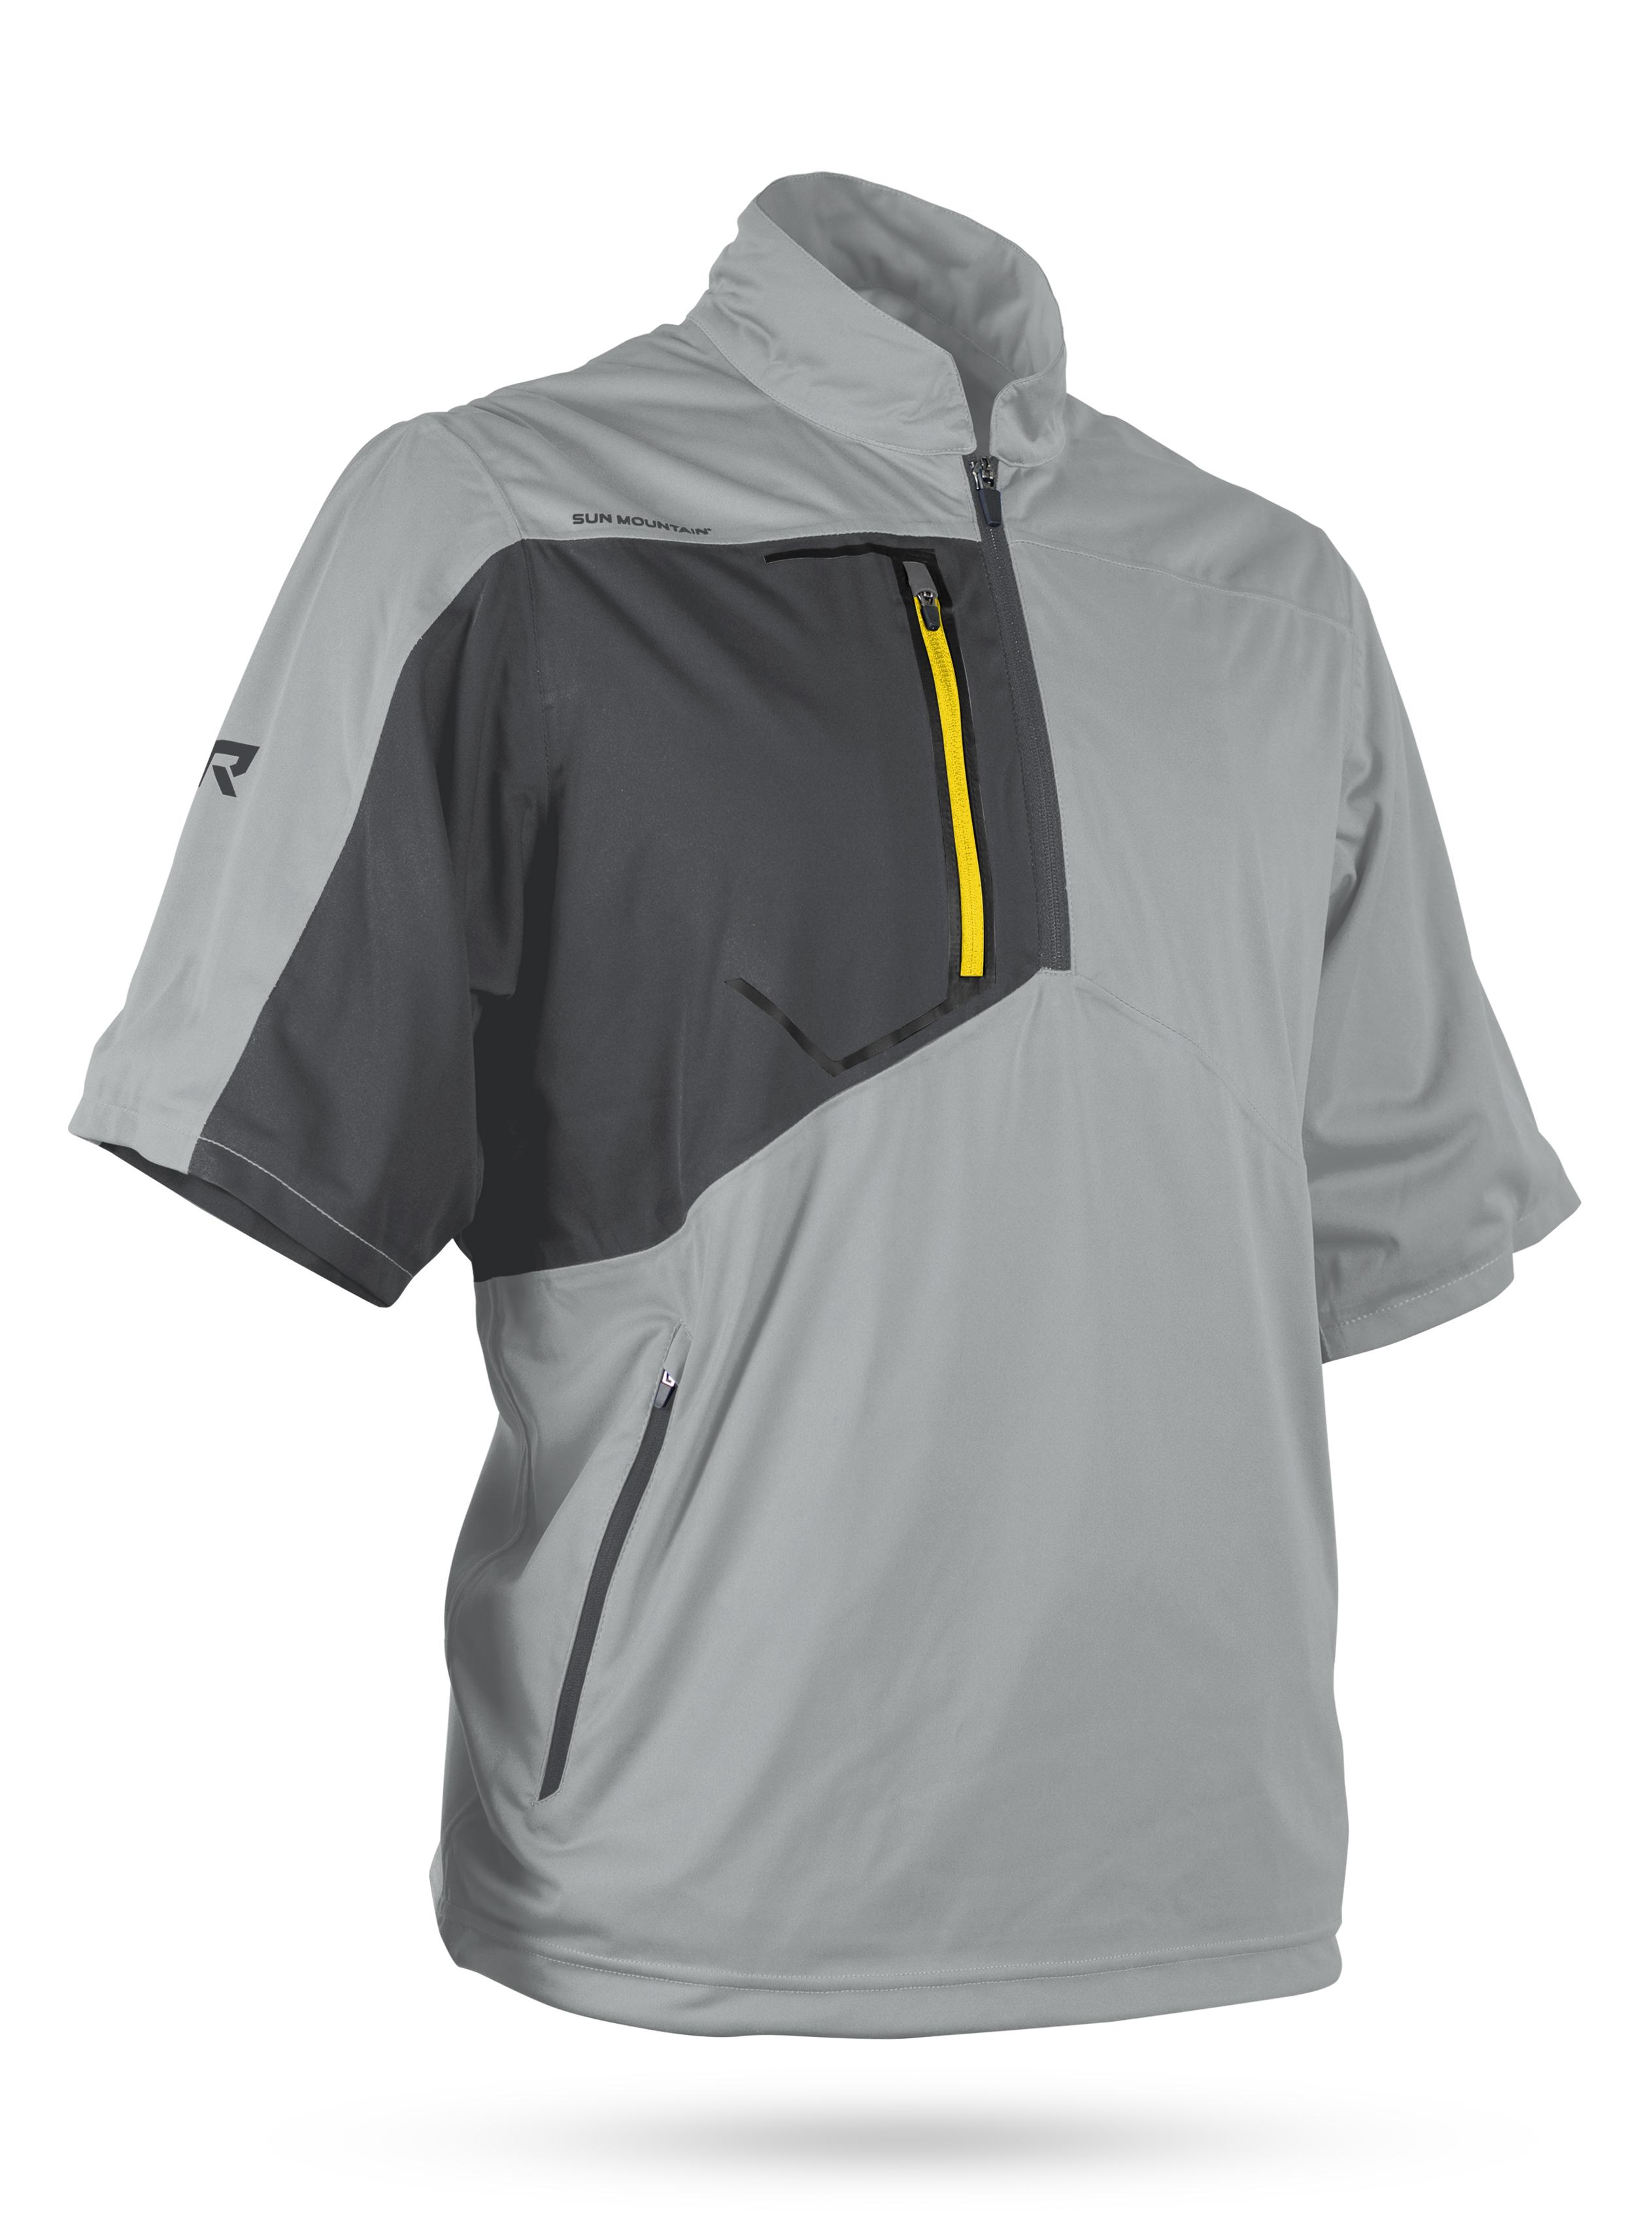 best men's golf shirts - sun mountain gray golf polo